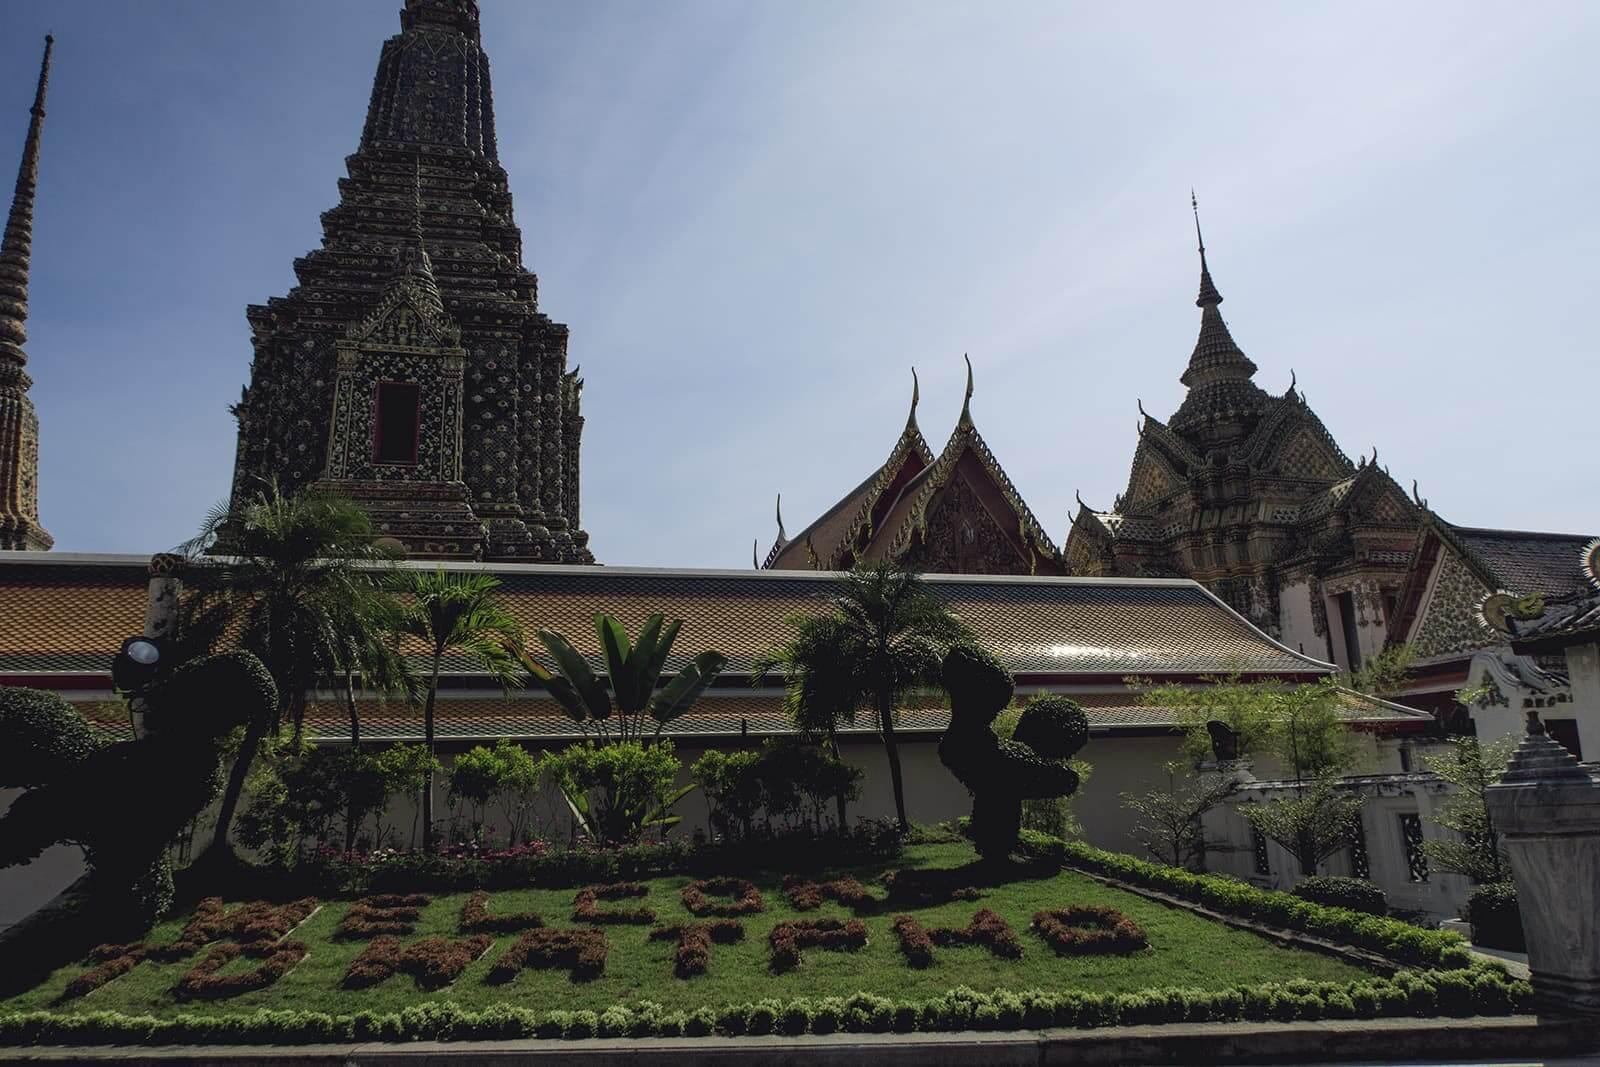 Alles schwarz am Wat Pho in Bangkok